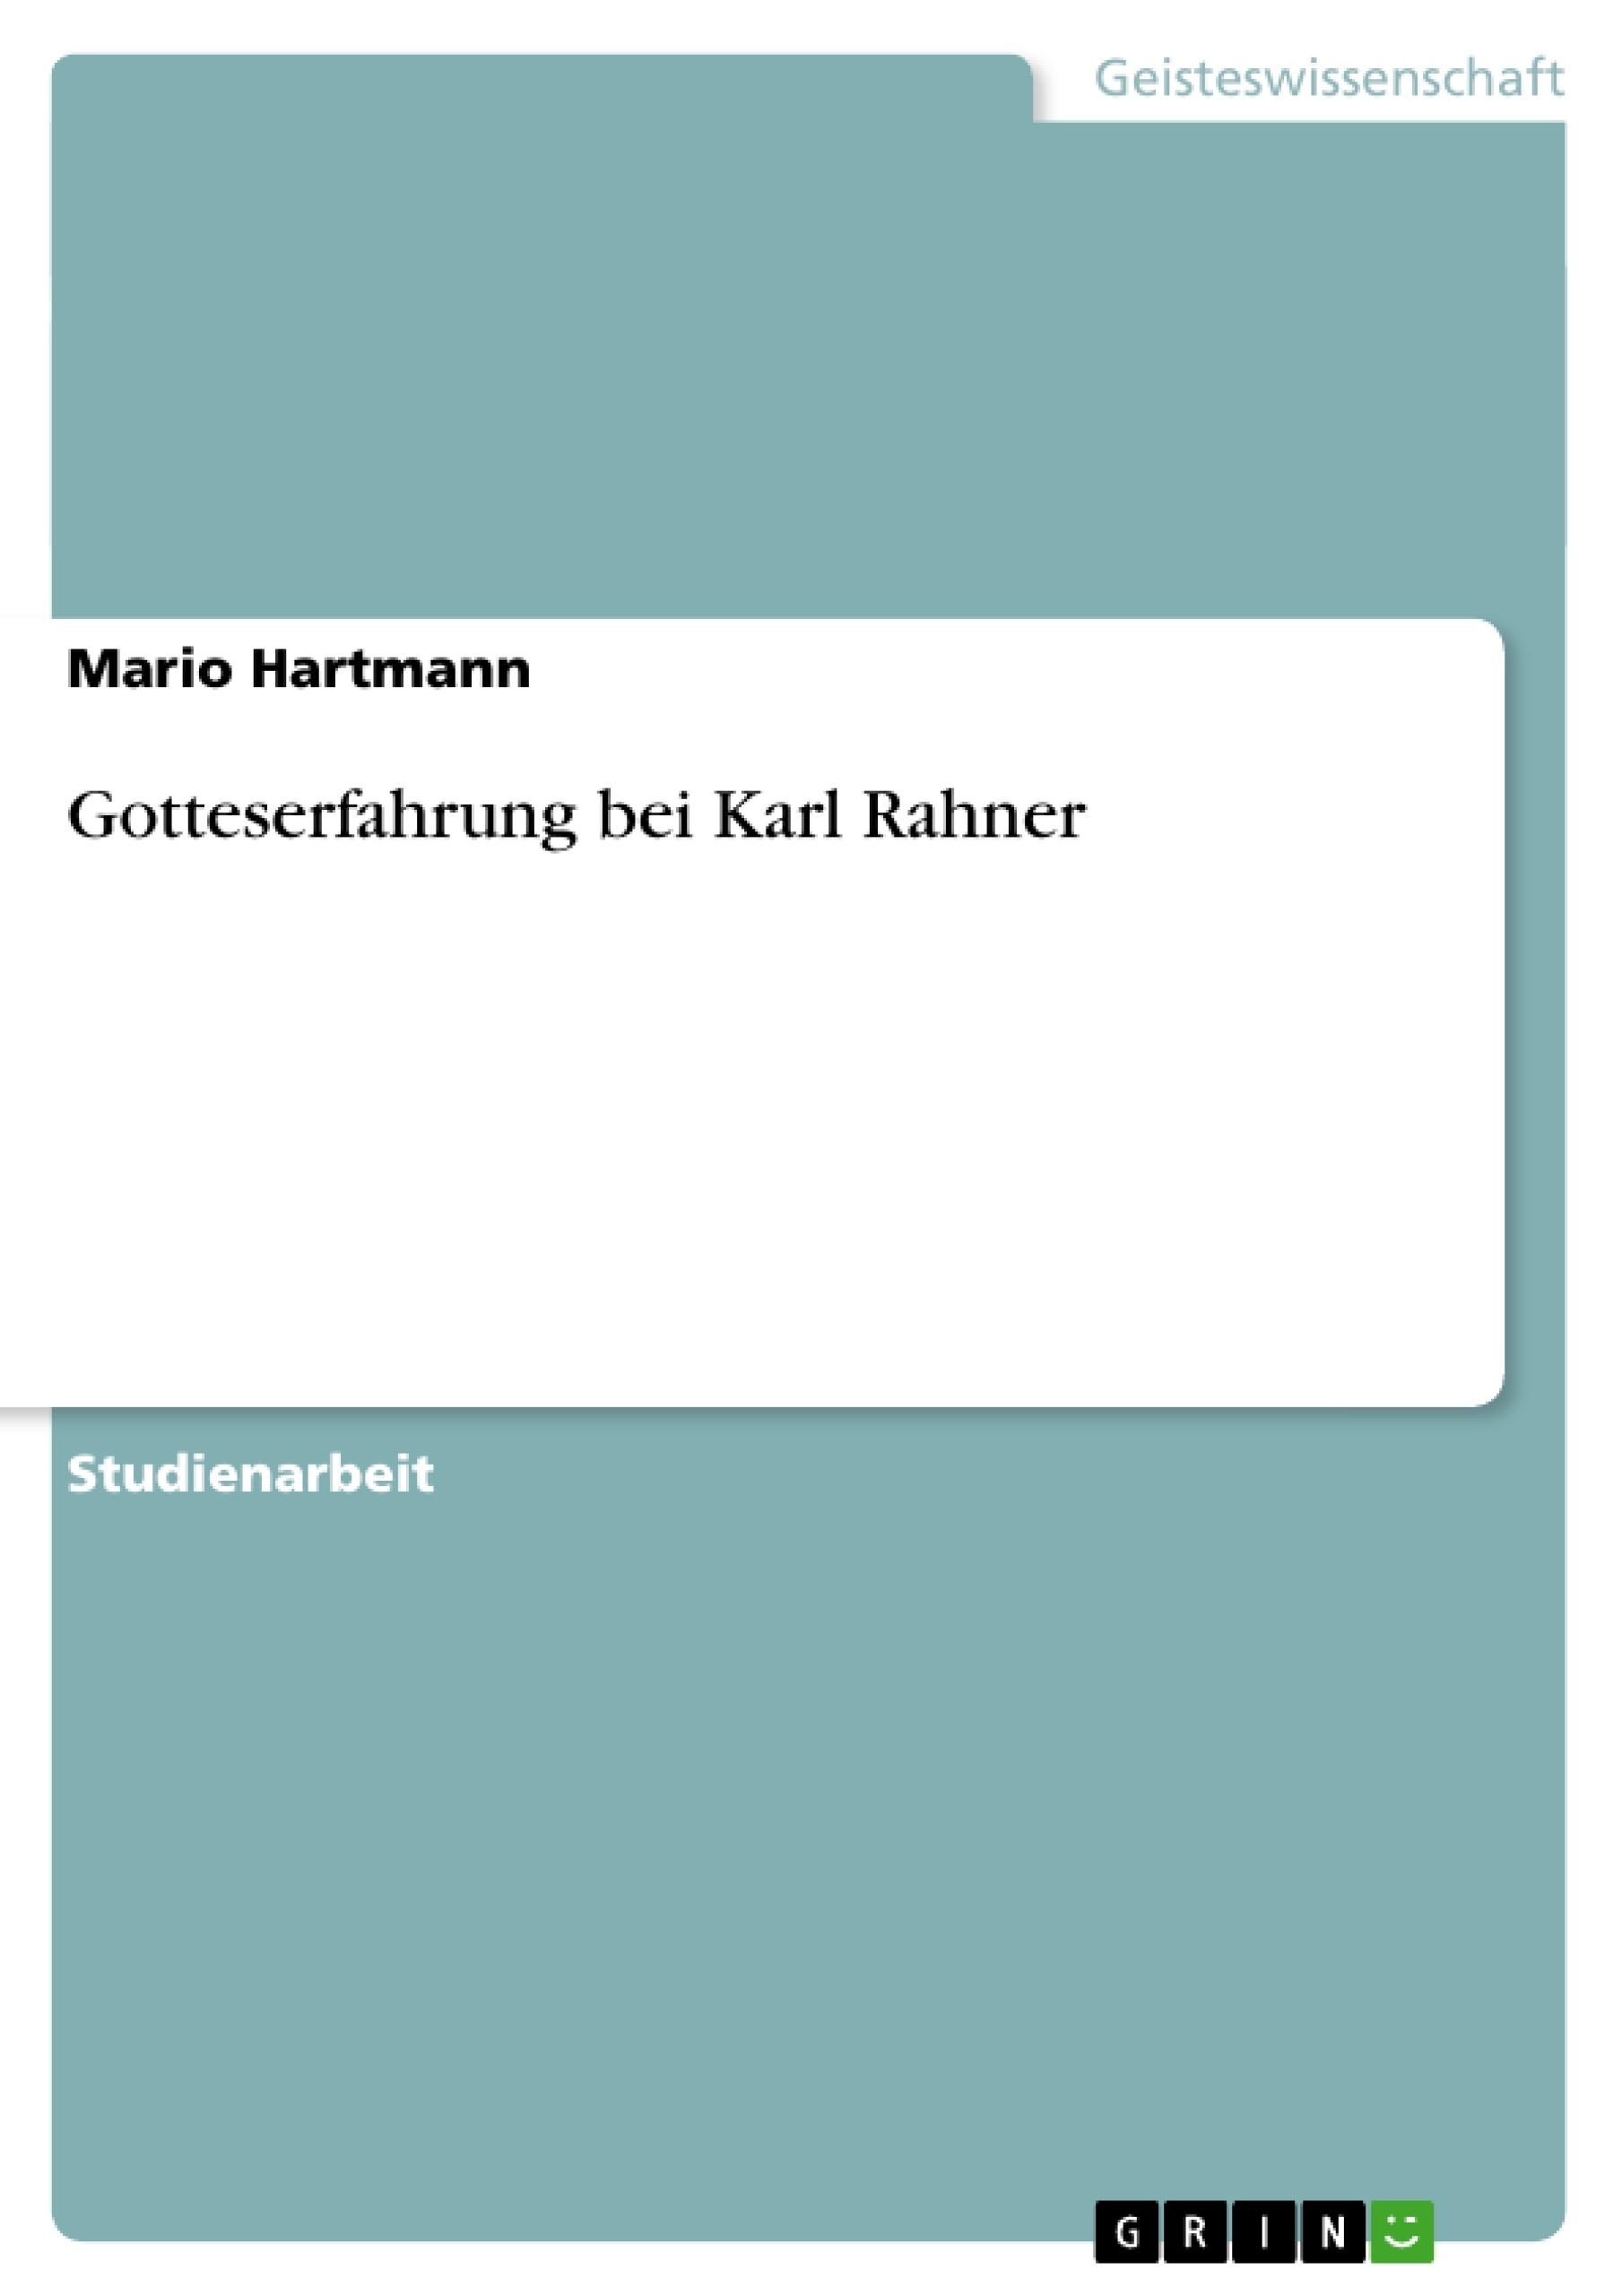 Titel: Gotteserfahrung bei Karl Rahner